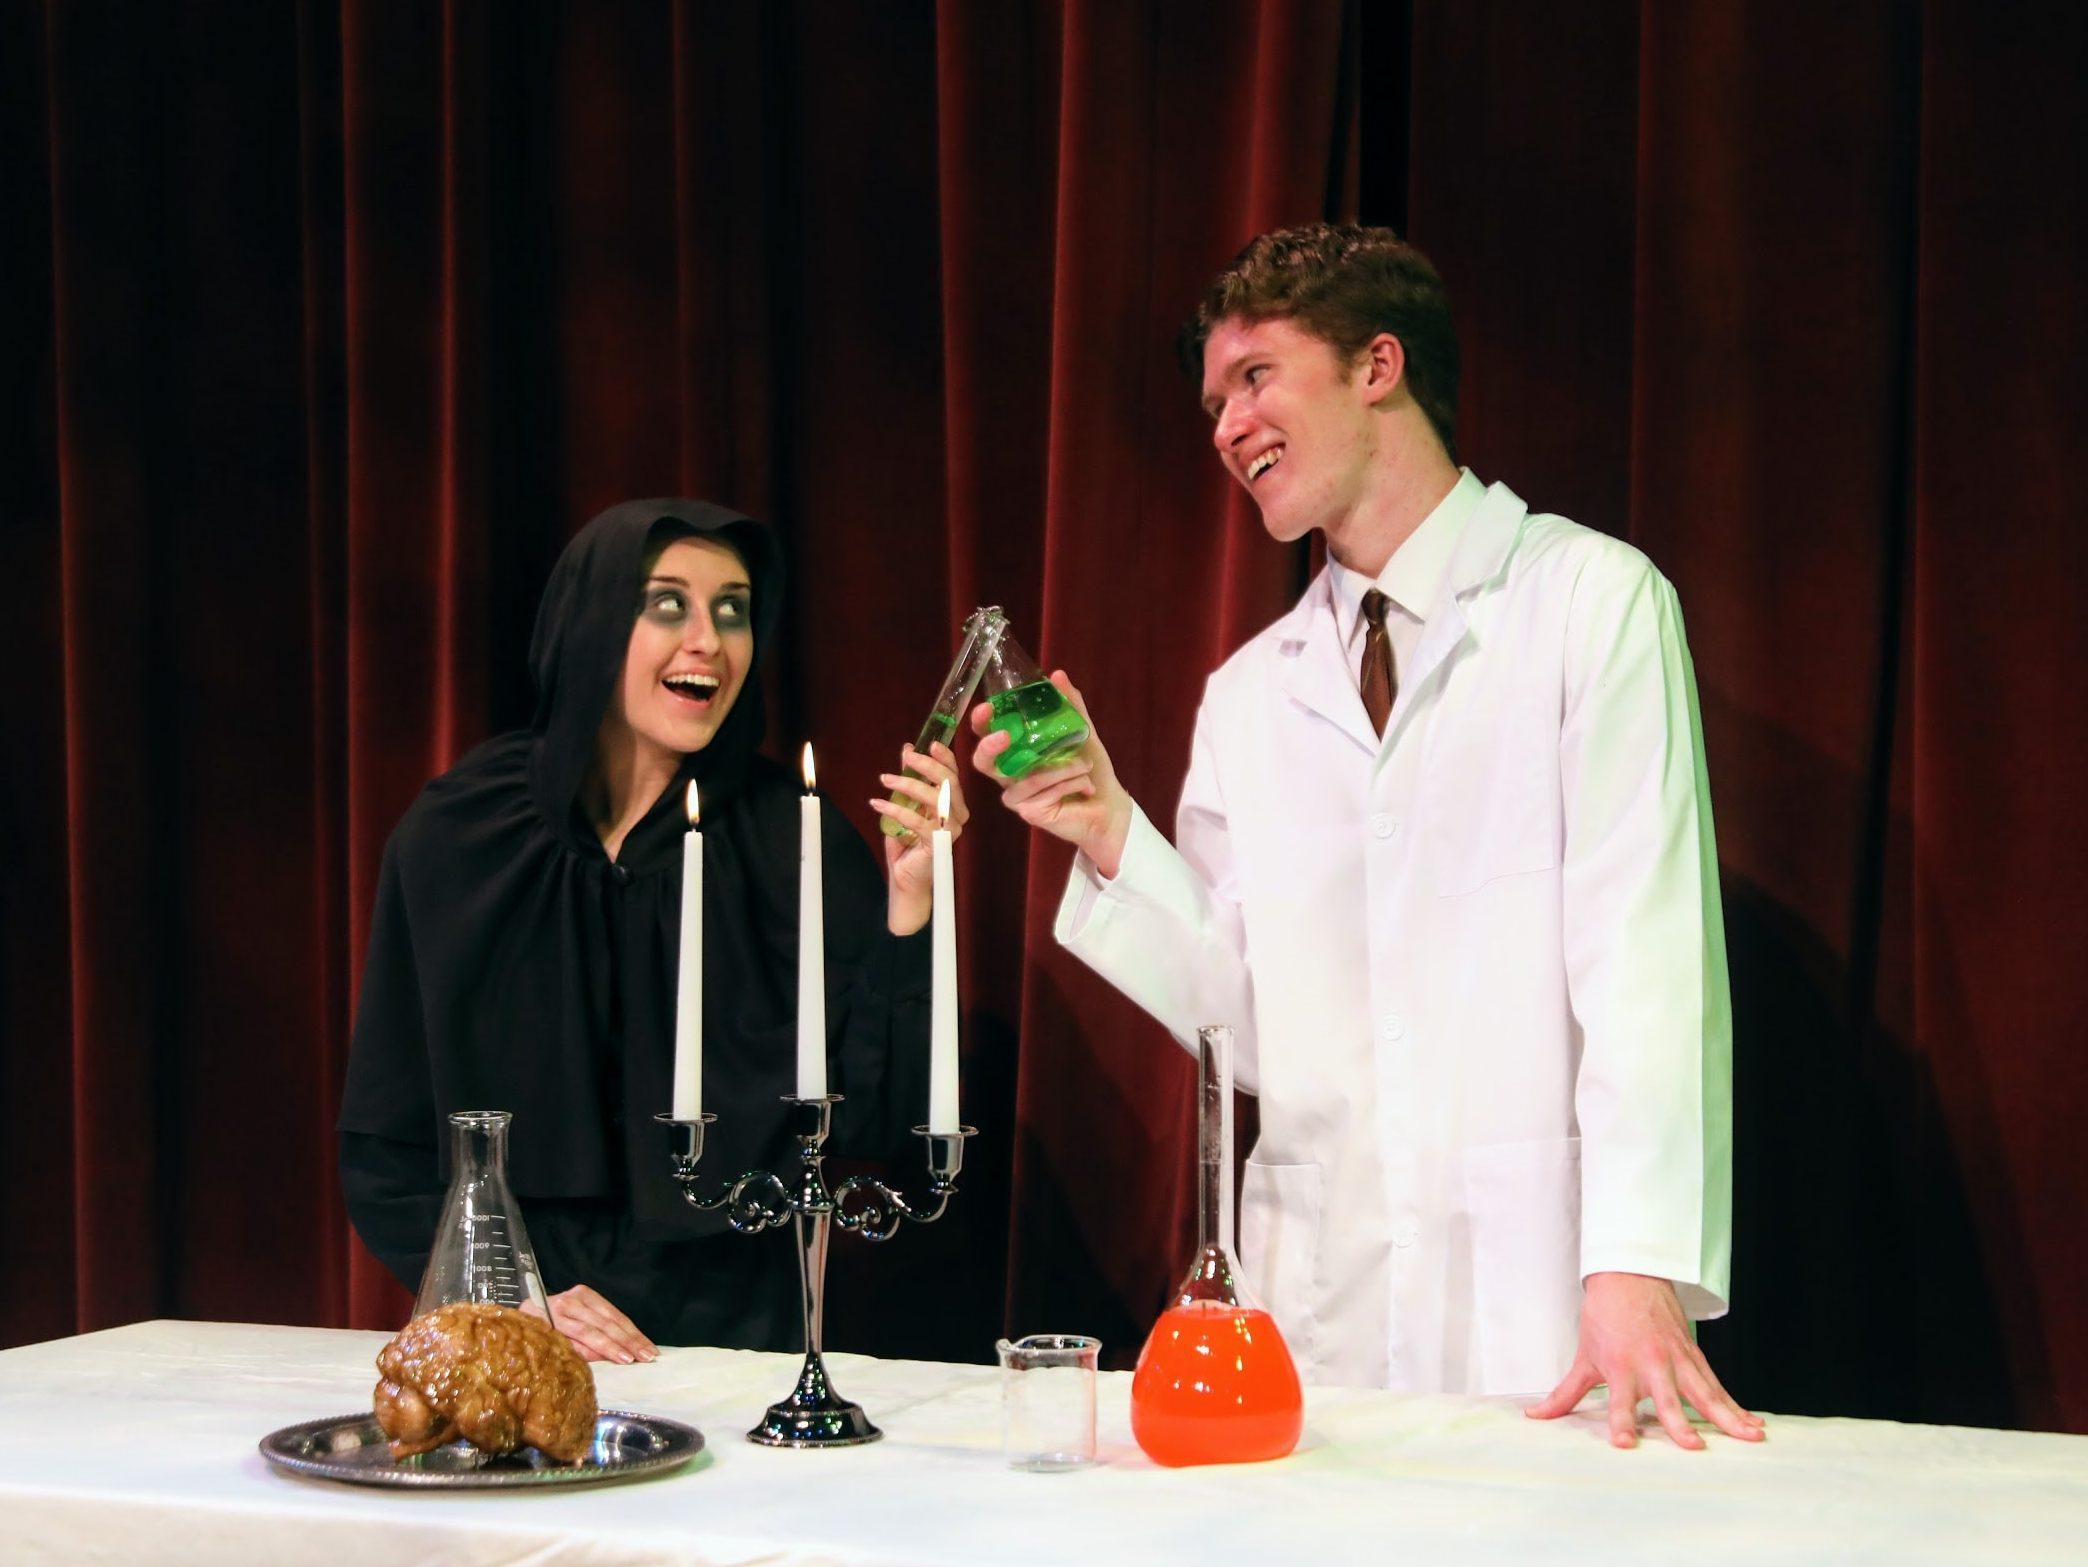 Igor and Dr. Frankenstein